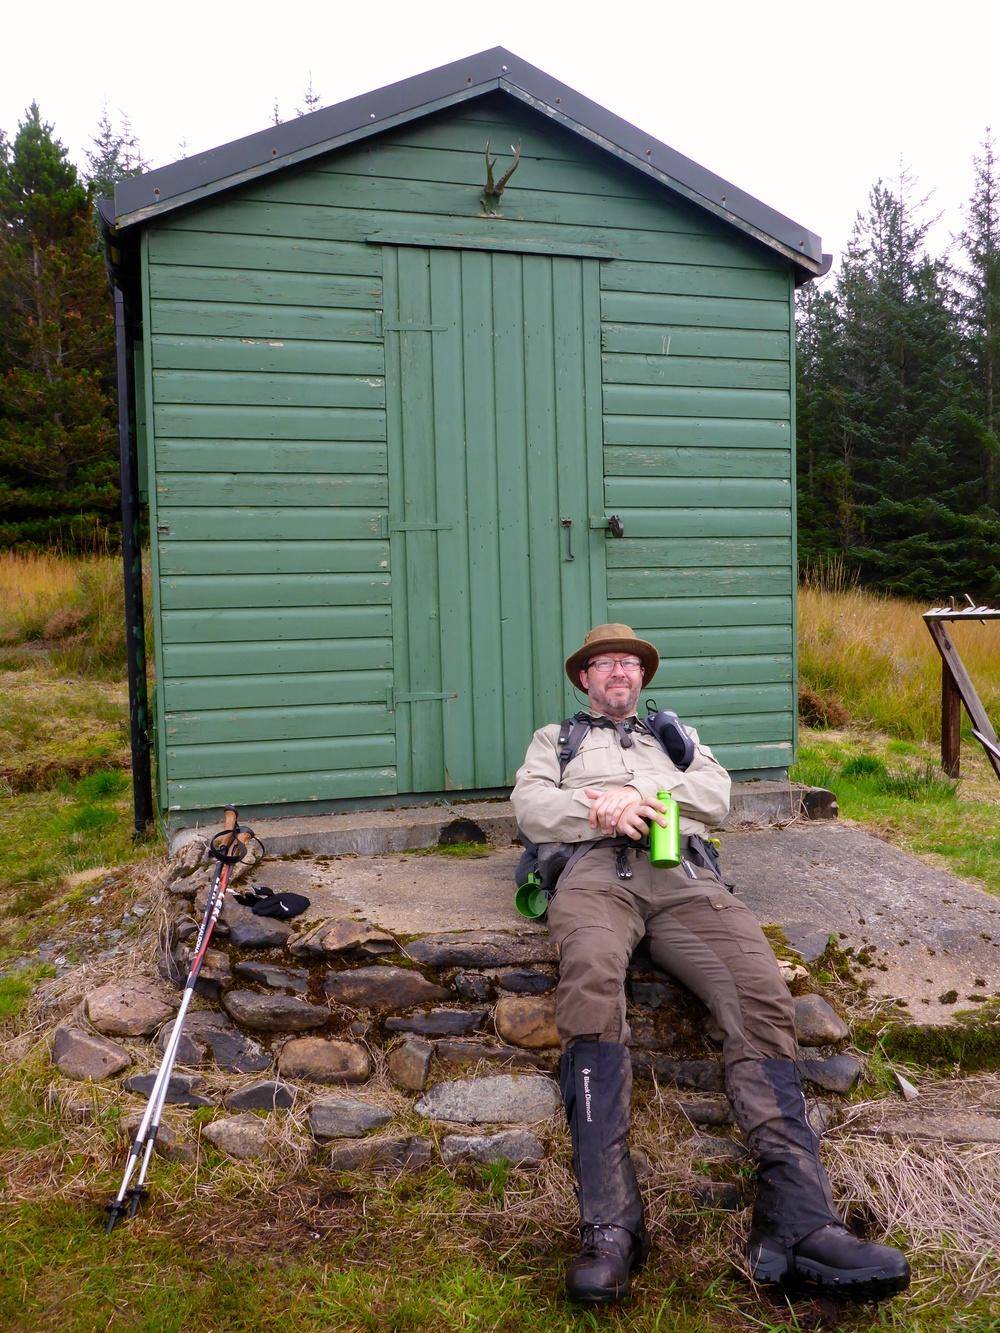 Relaxing beside a fishing hut in Glen Oykel. Those long legs make short work of the distance!